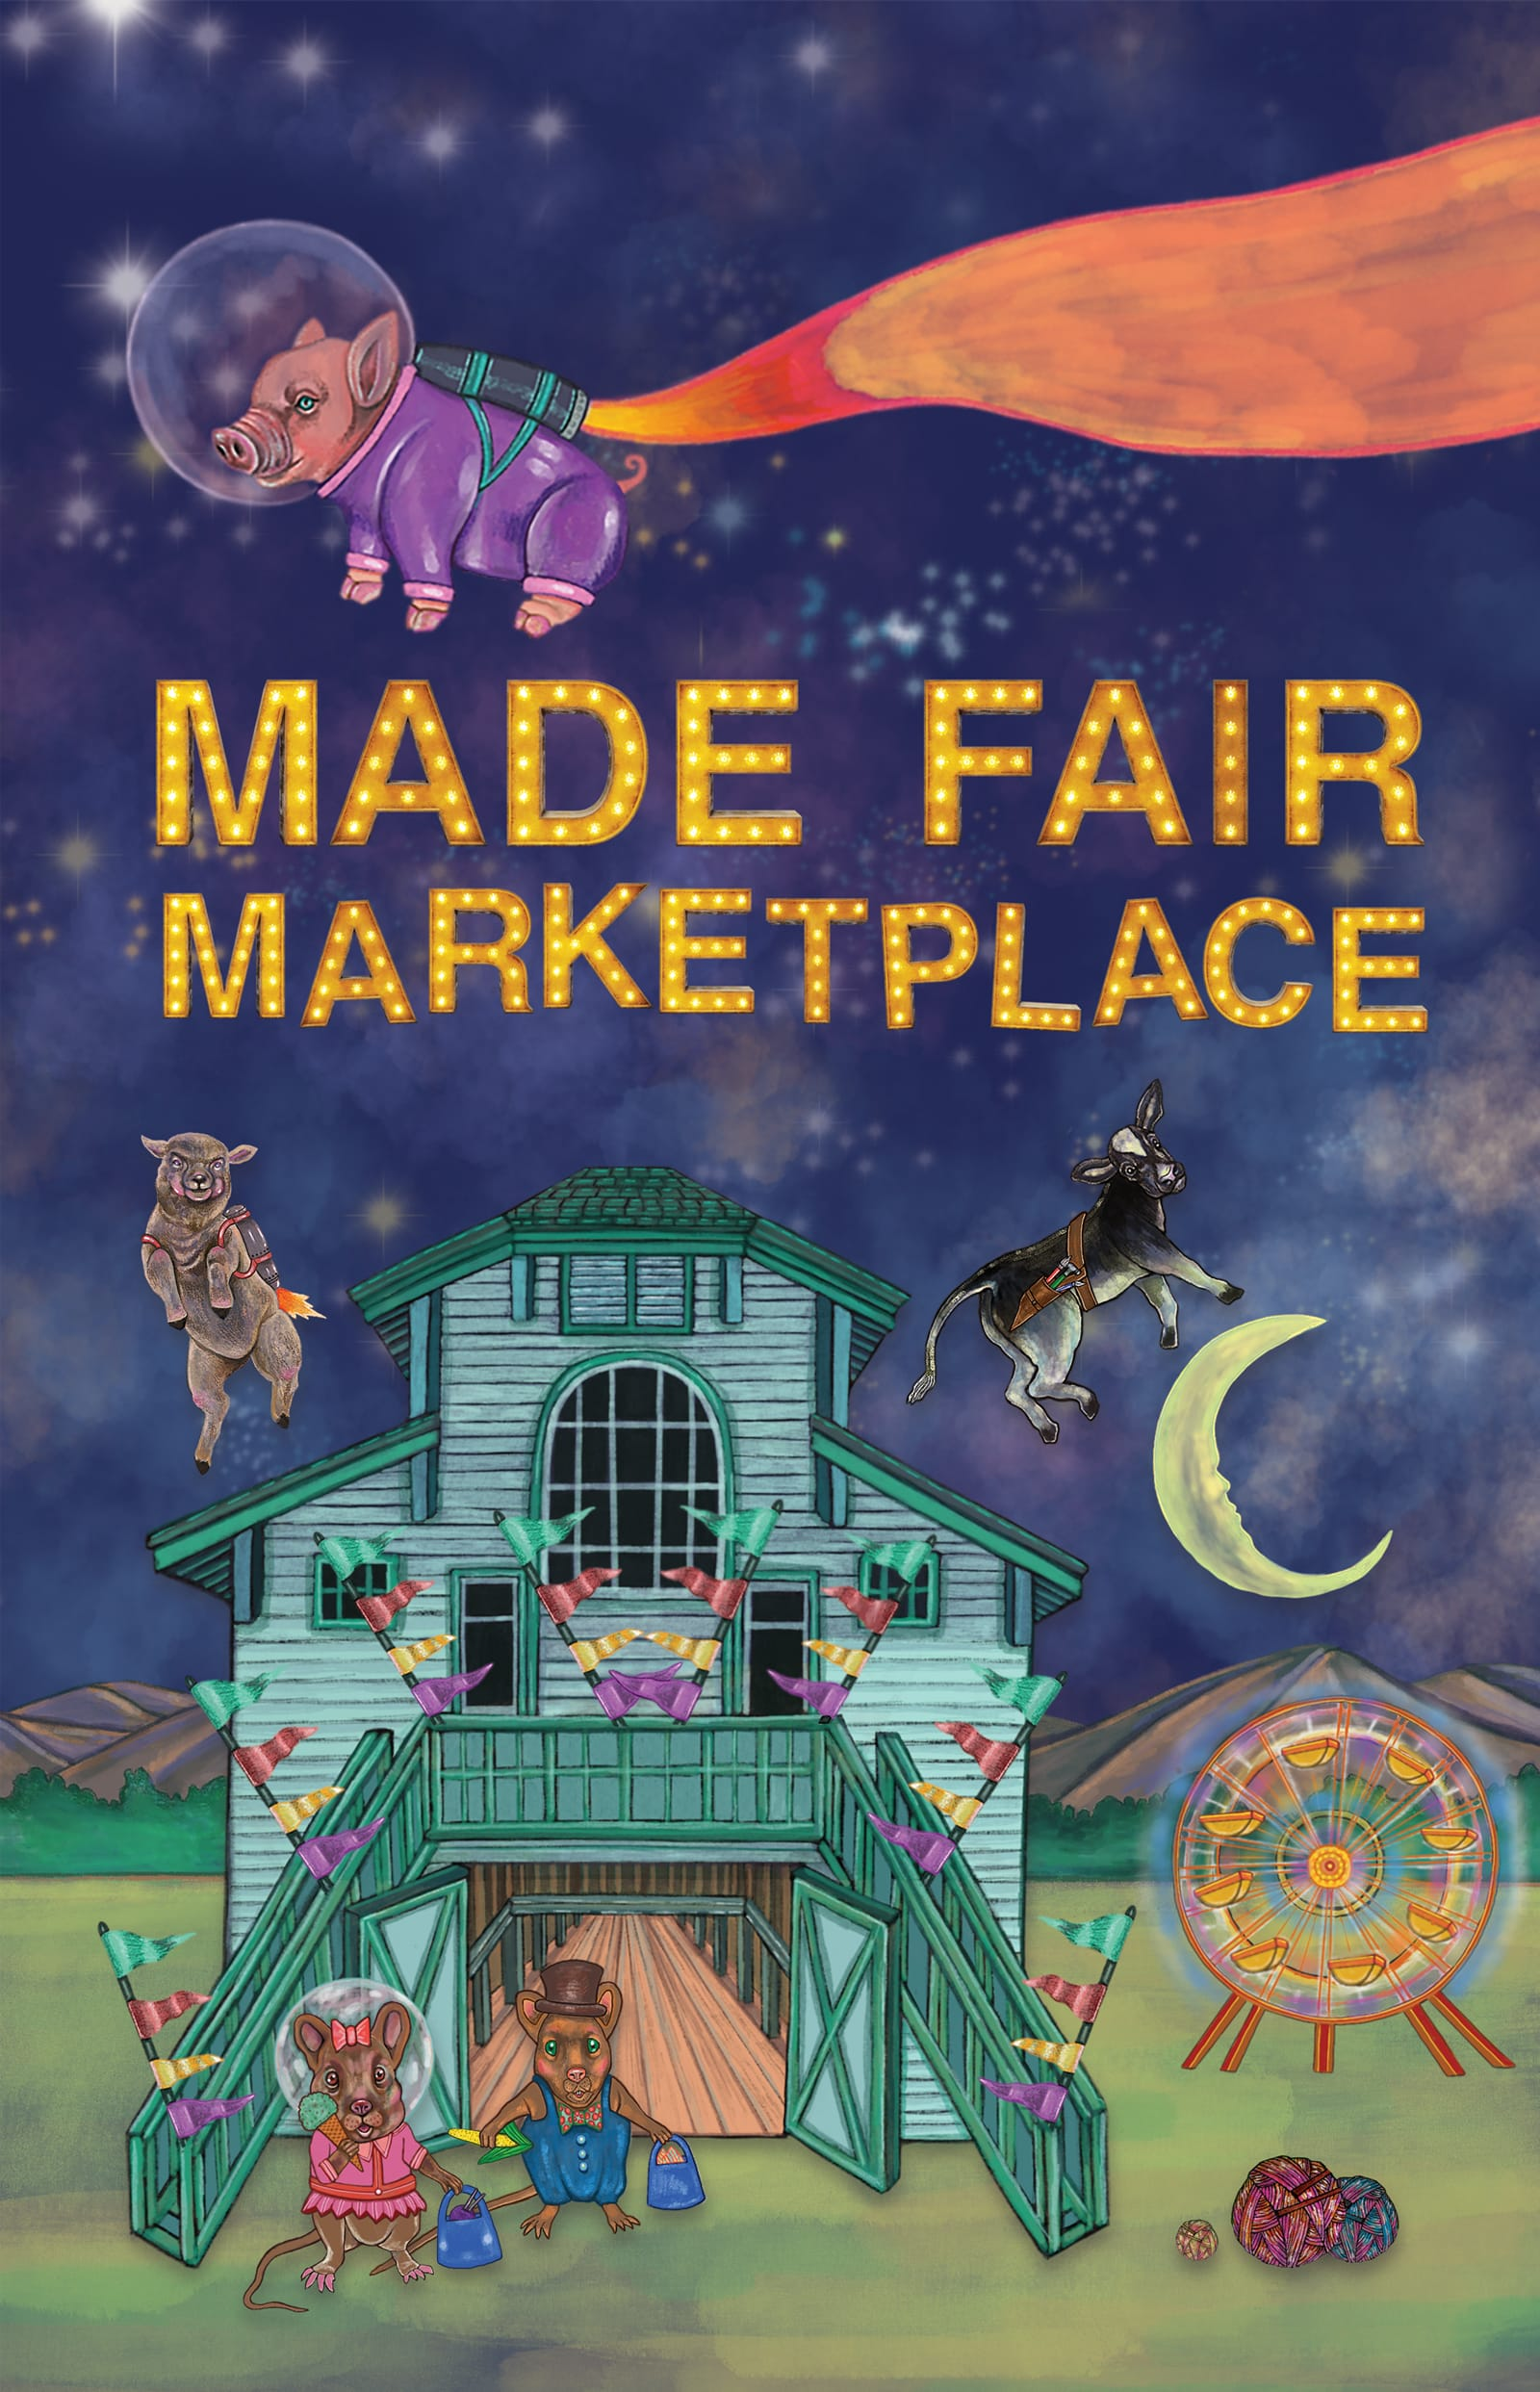 2018 Handmade Marketplace Poster by Courtney Blazon